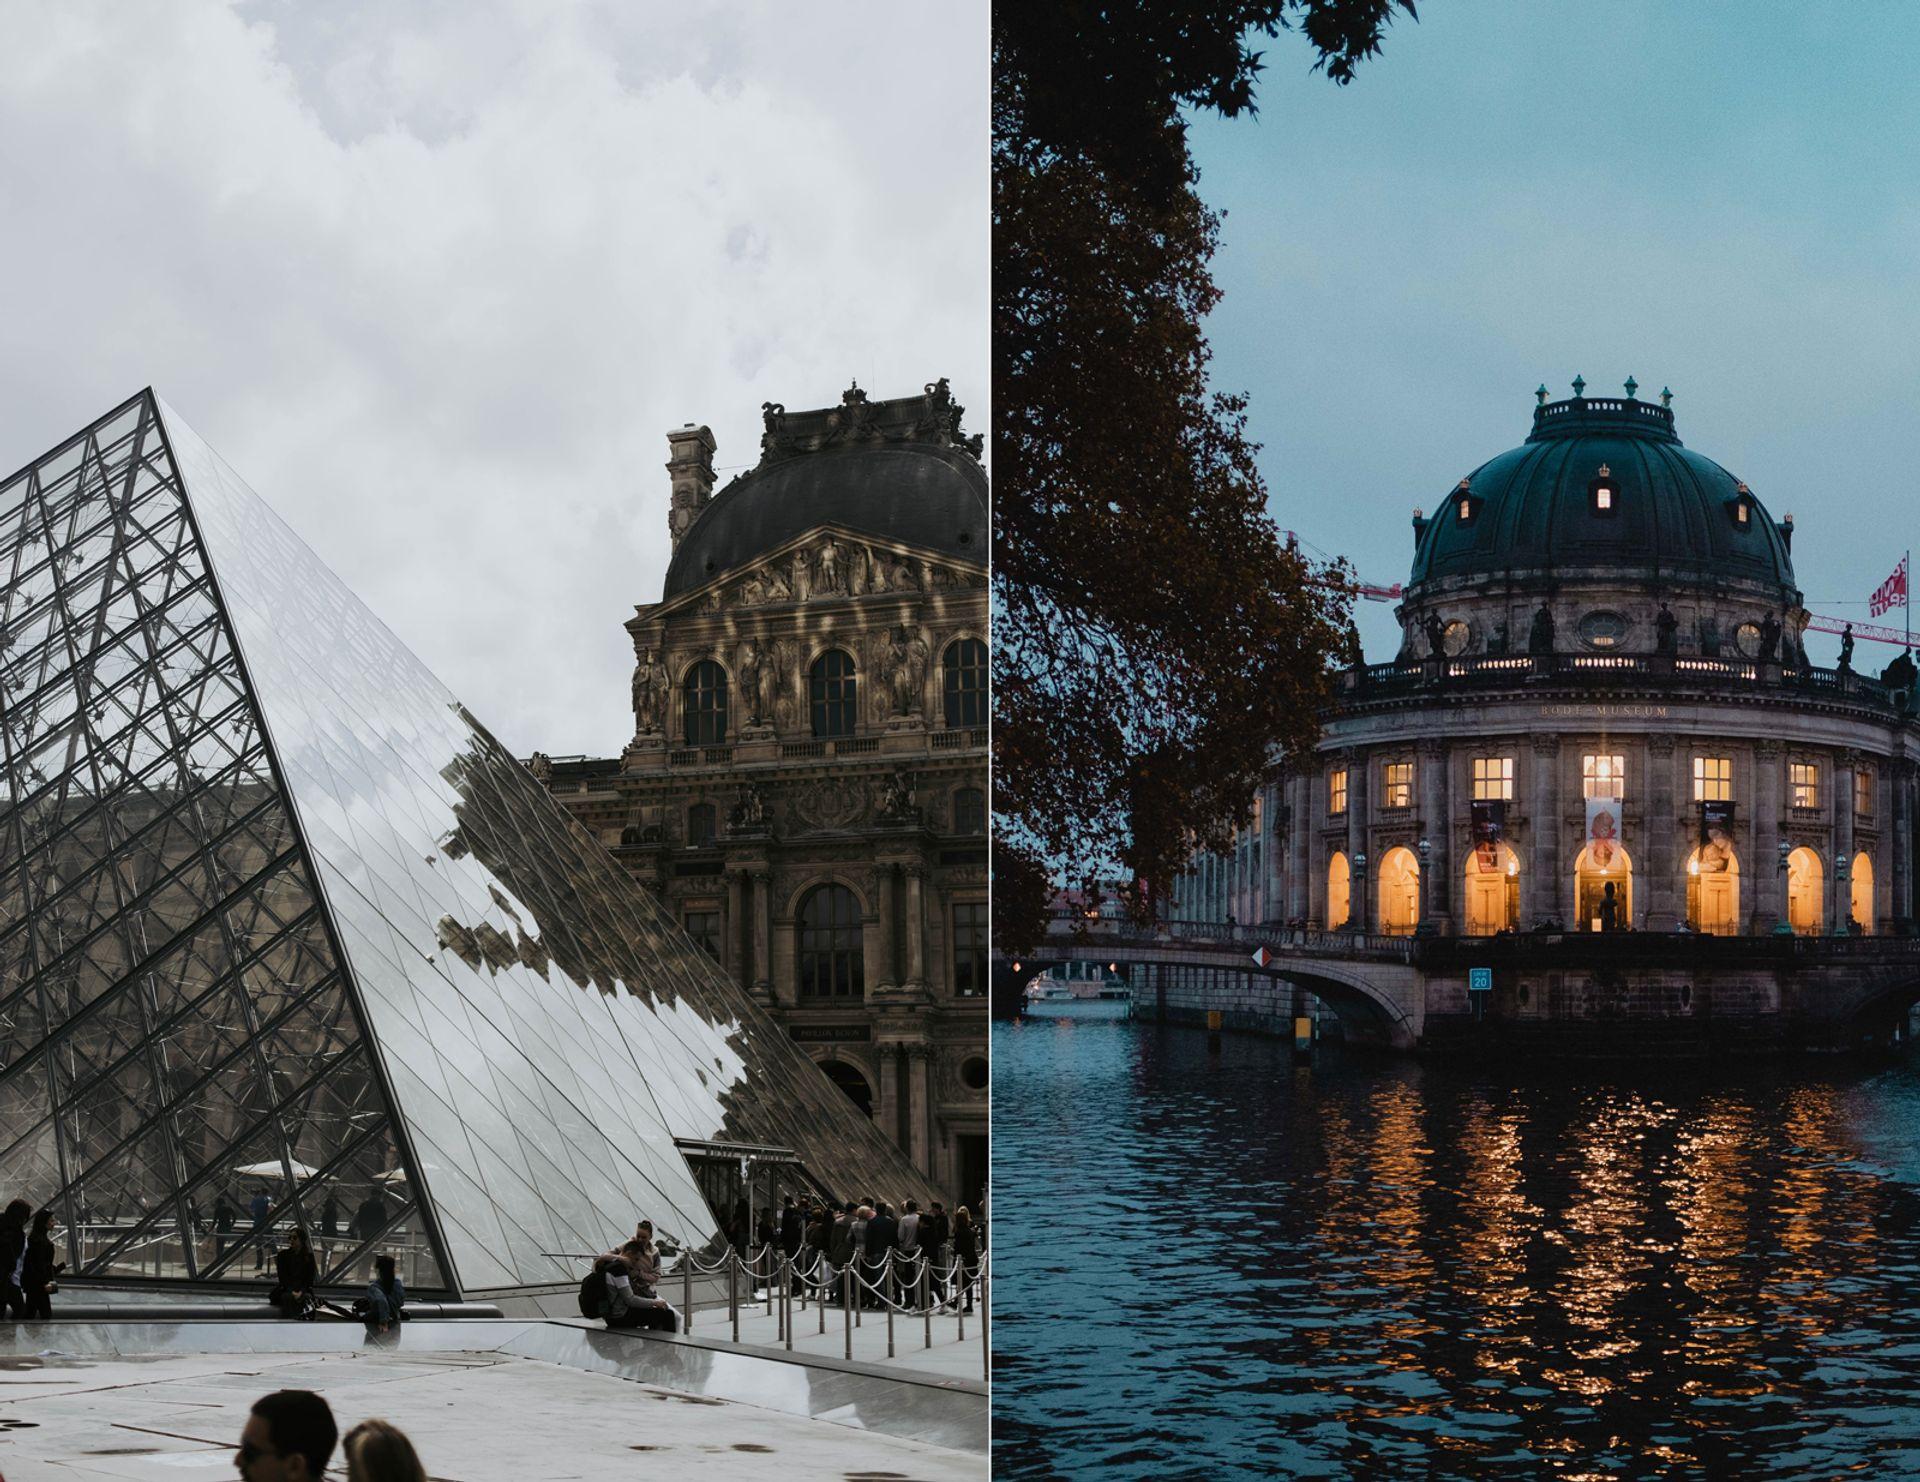 Louvre is closing until 1 December, but German museums still have their lights on Images: Louvre: © Austin Kehmeier; Bode Museum: © Danil Sorokin